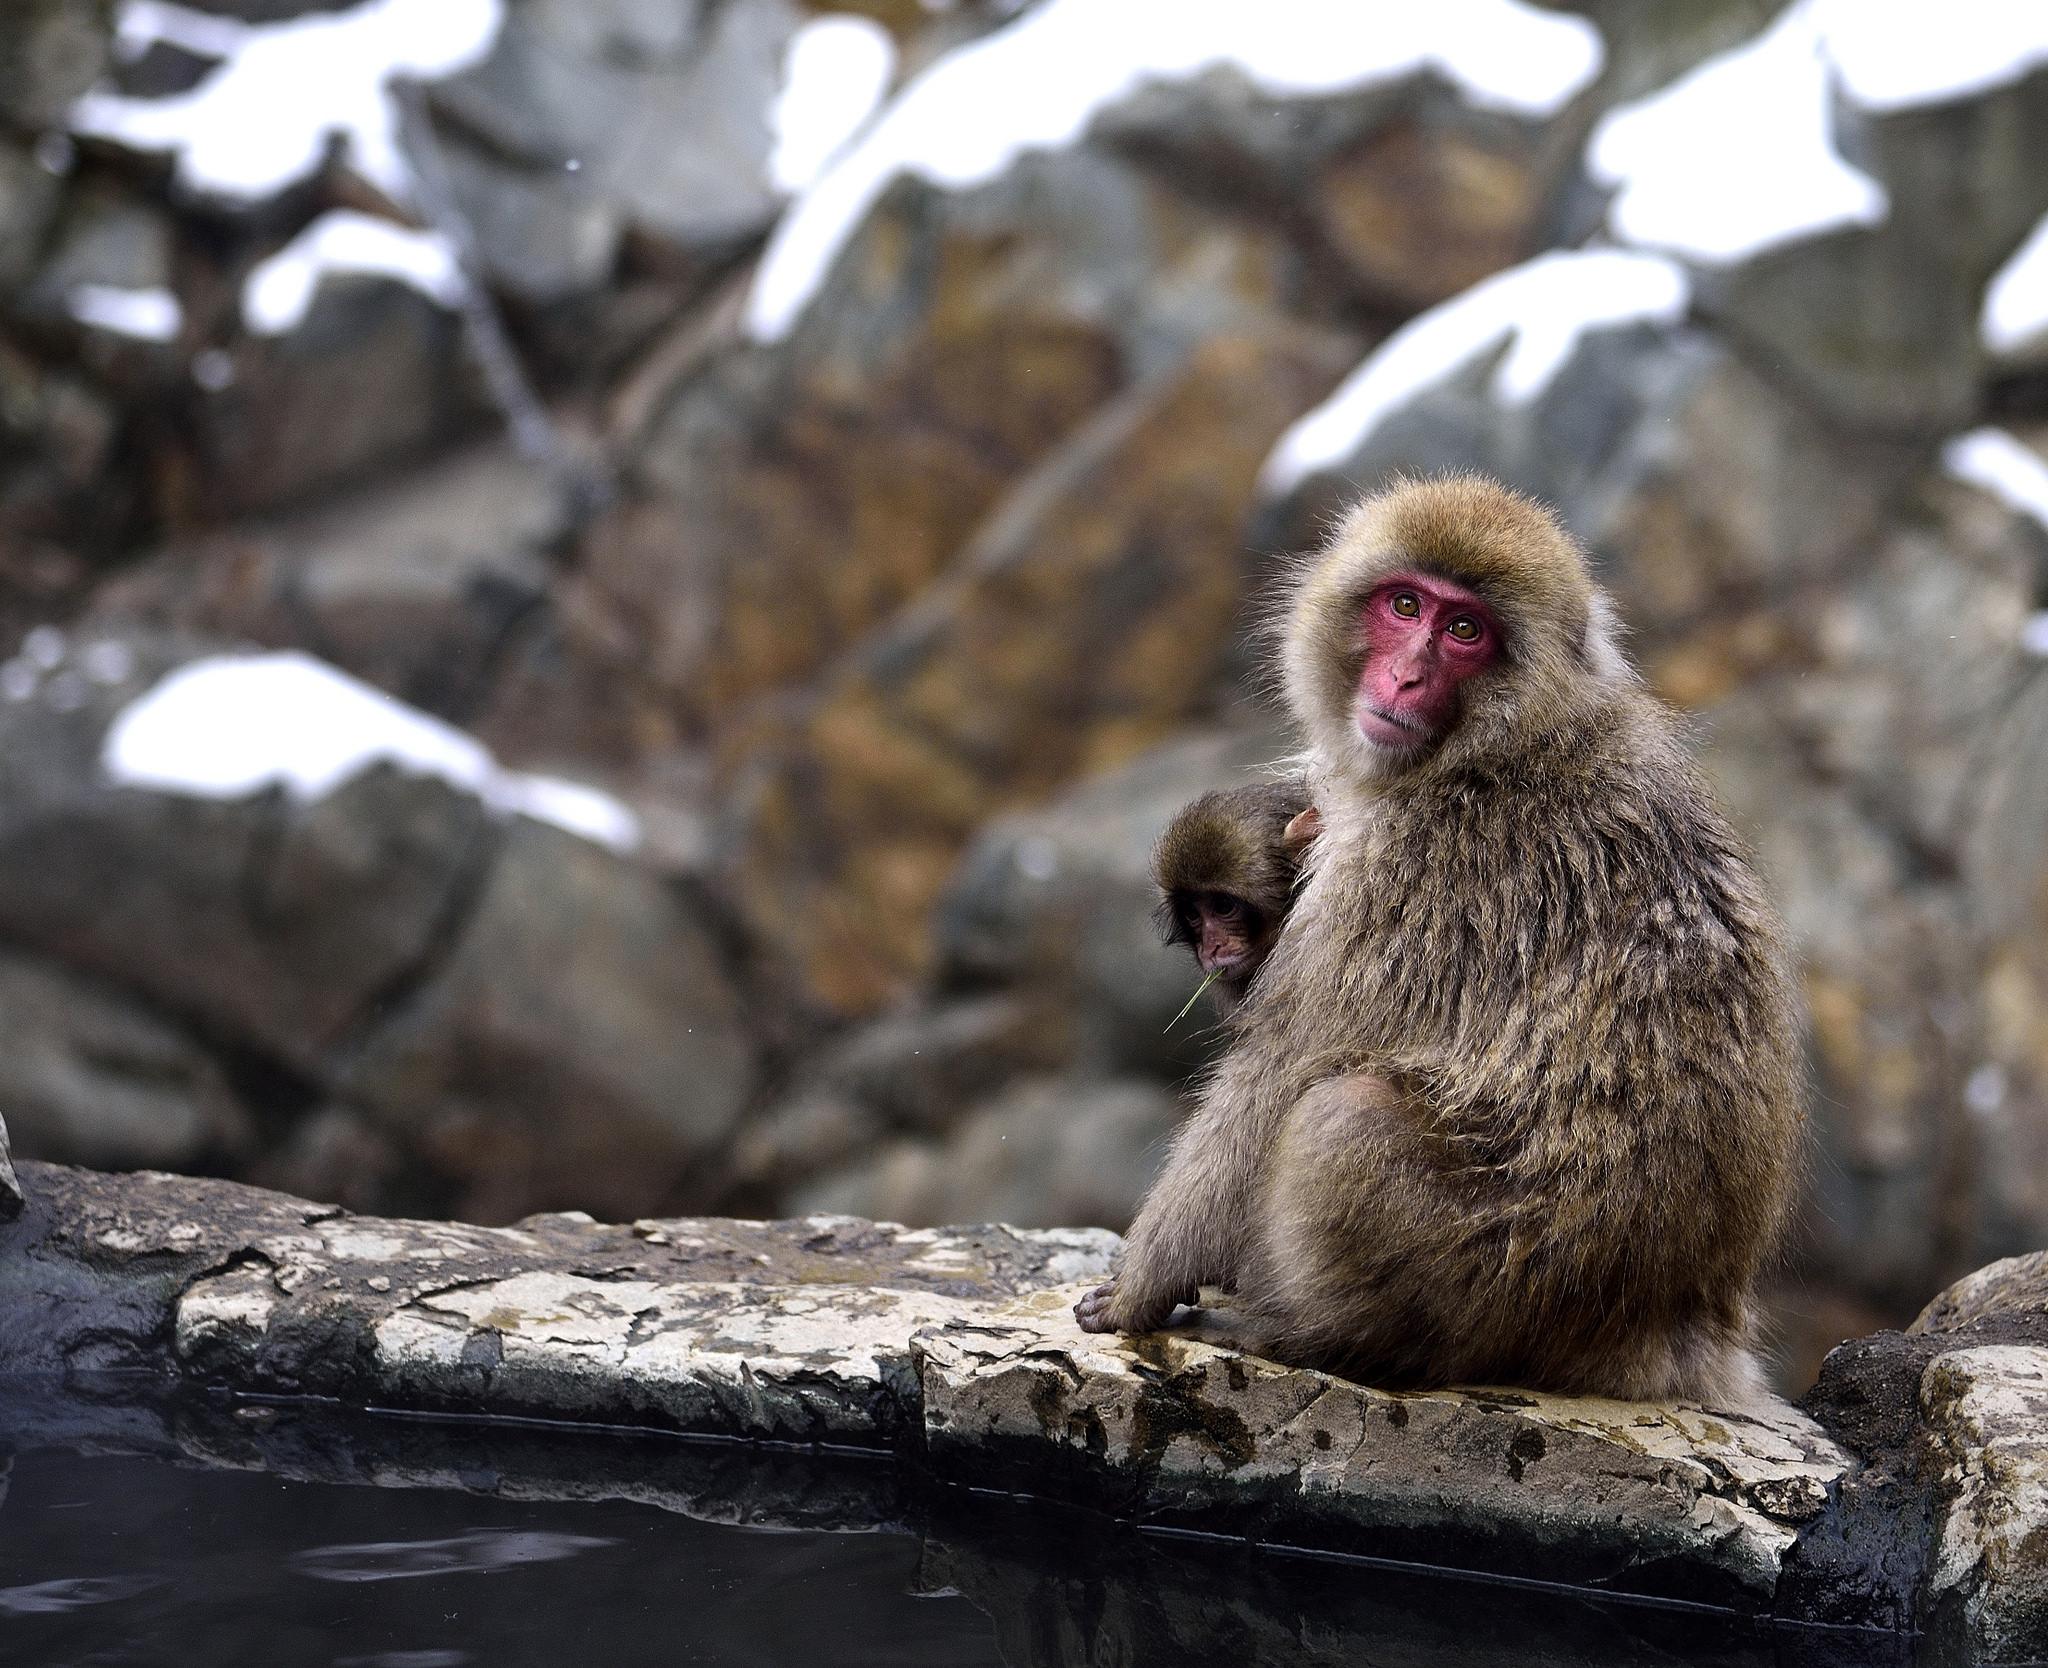 The famous Japanese bathing monkeys. Image credit:  MarPa87 / Creative Commons